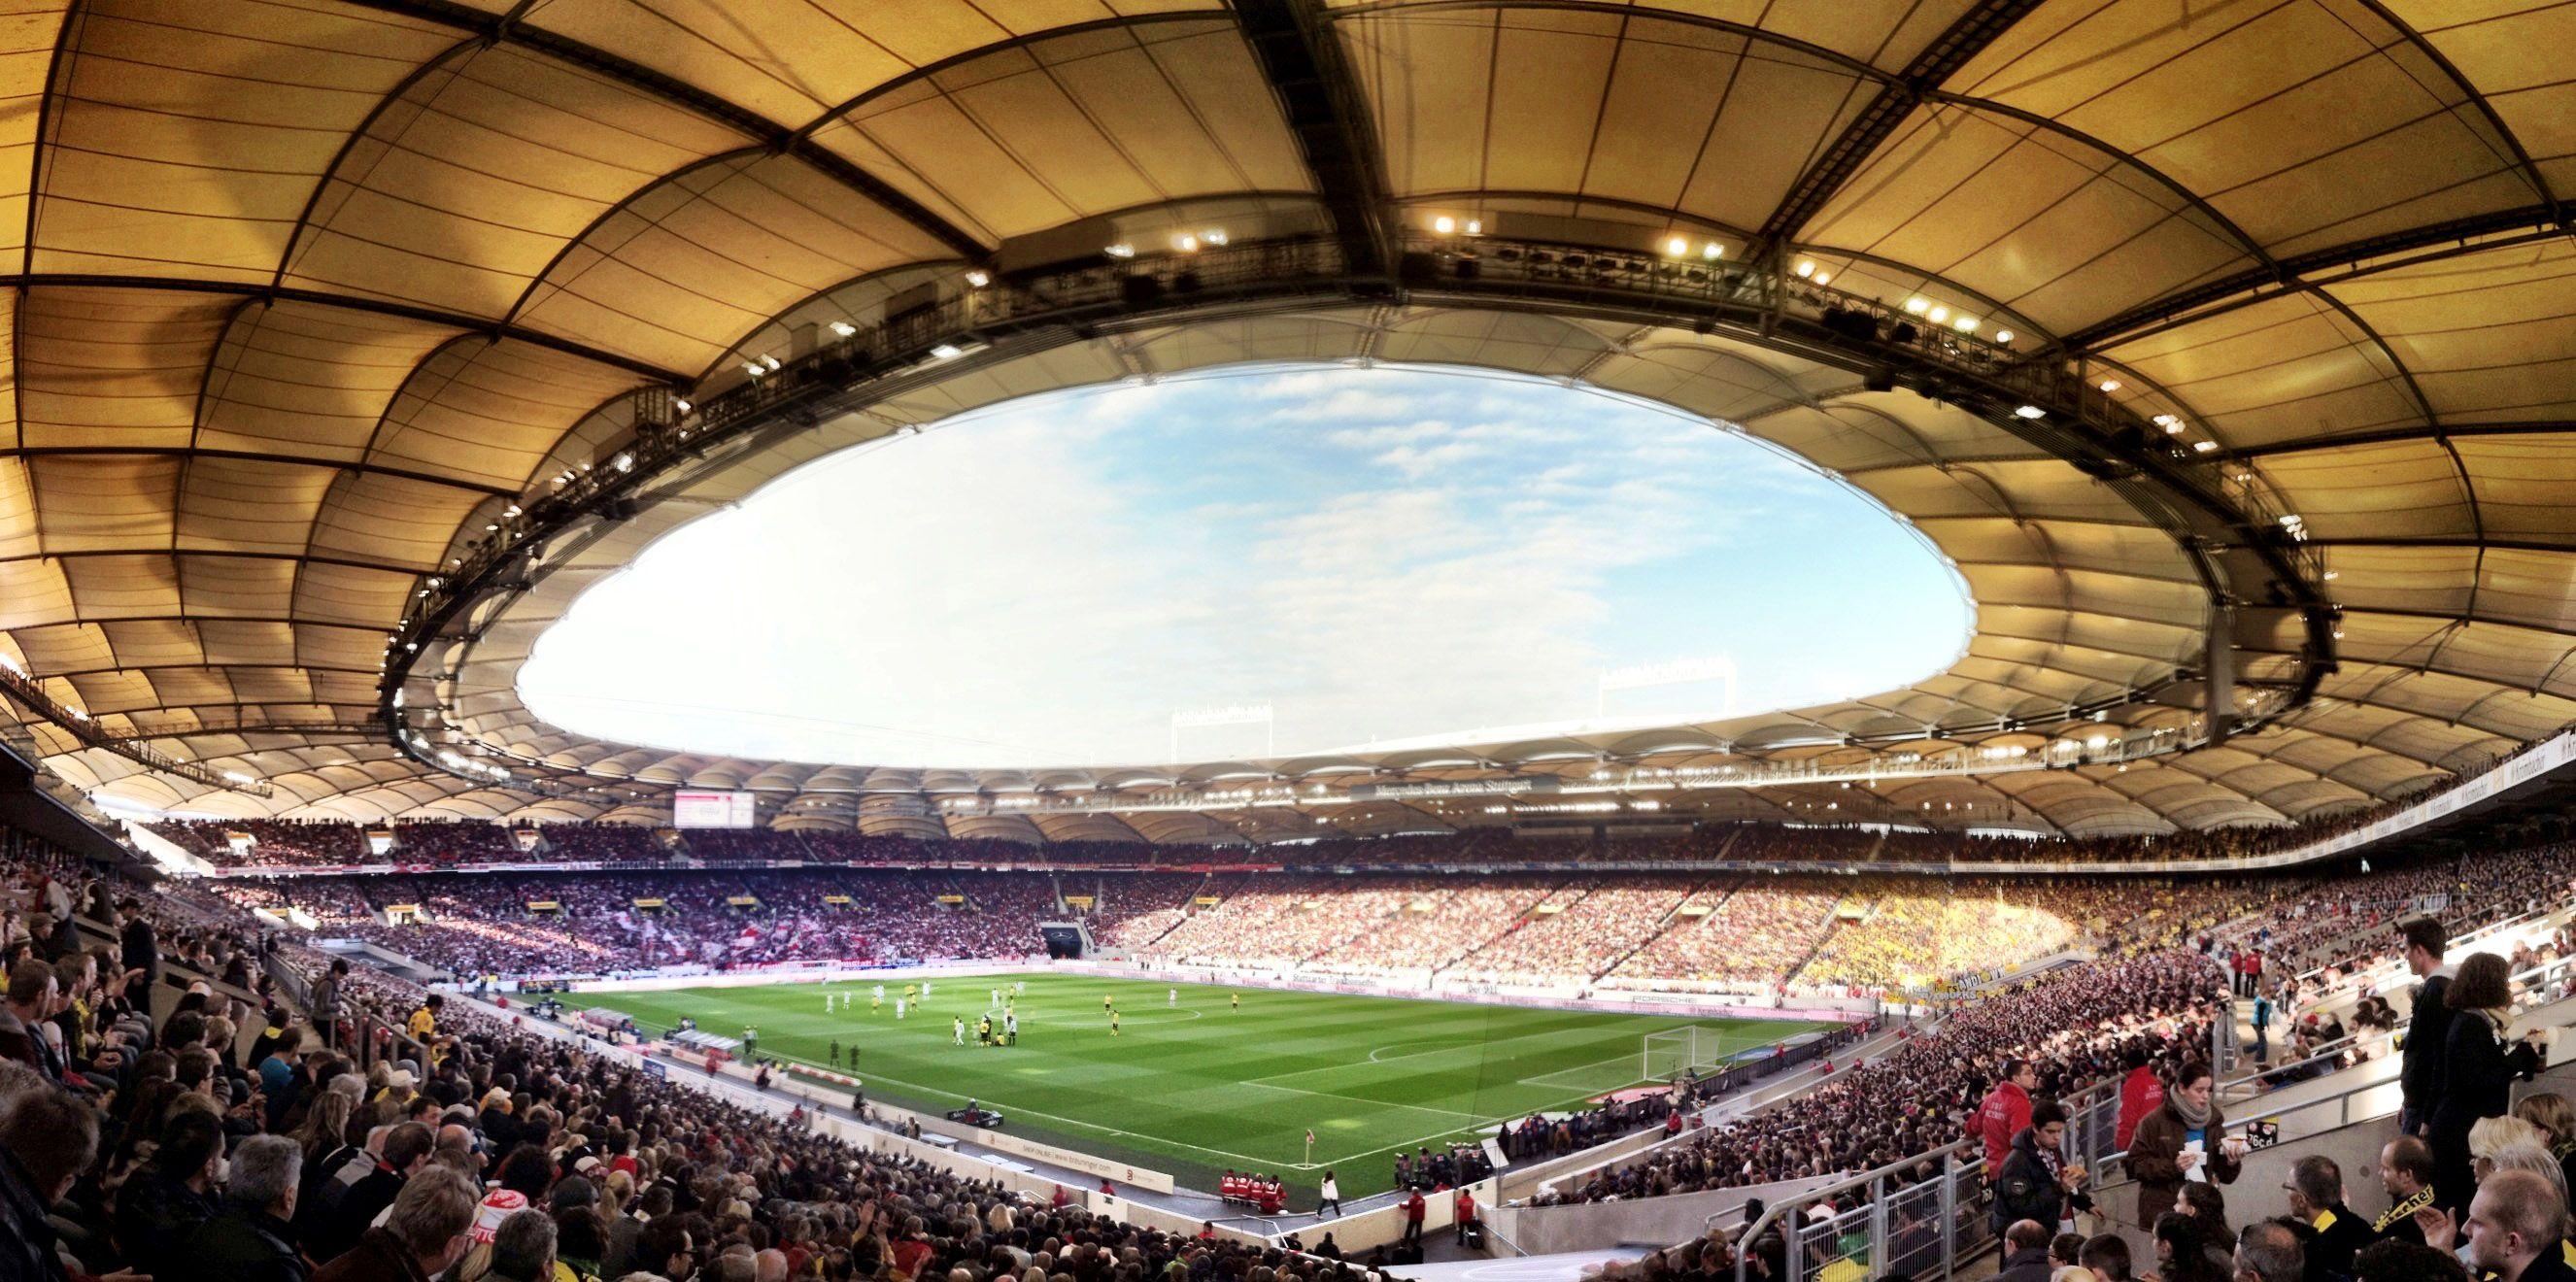 Stuttgart Mercedes Benz Arena 9ine Stuttgart Mercedes Benz